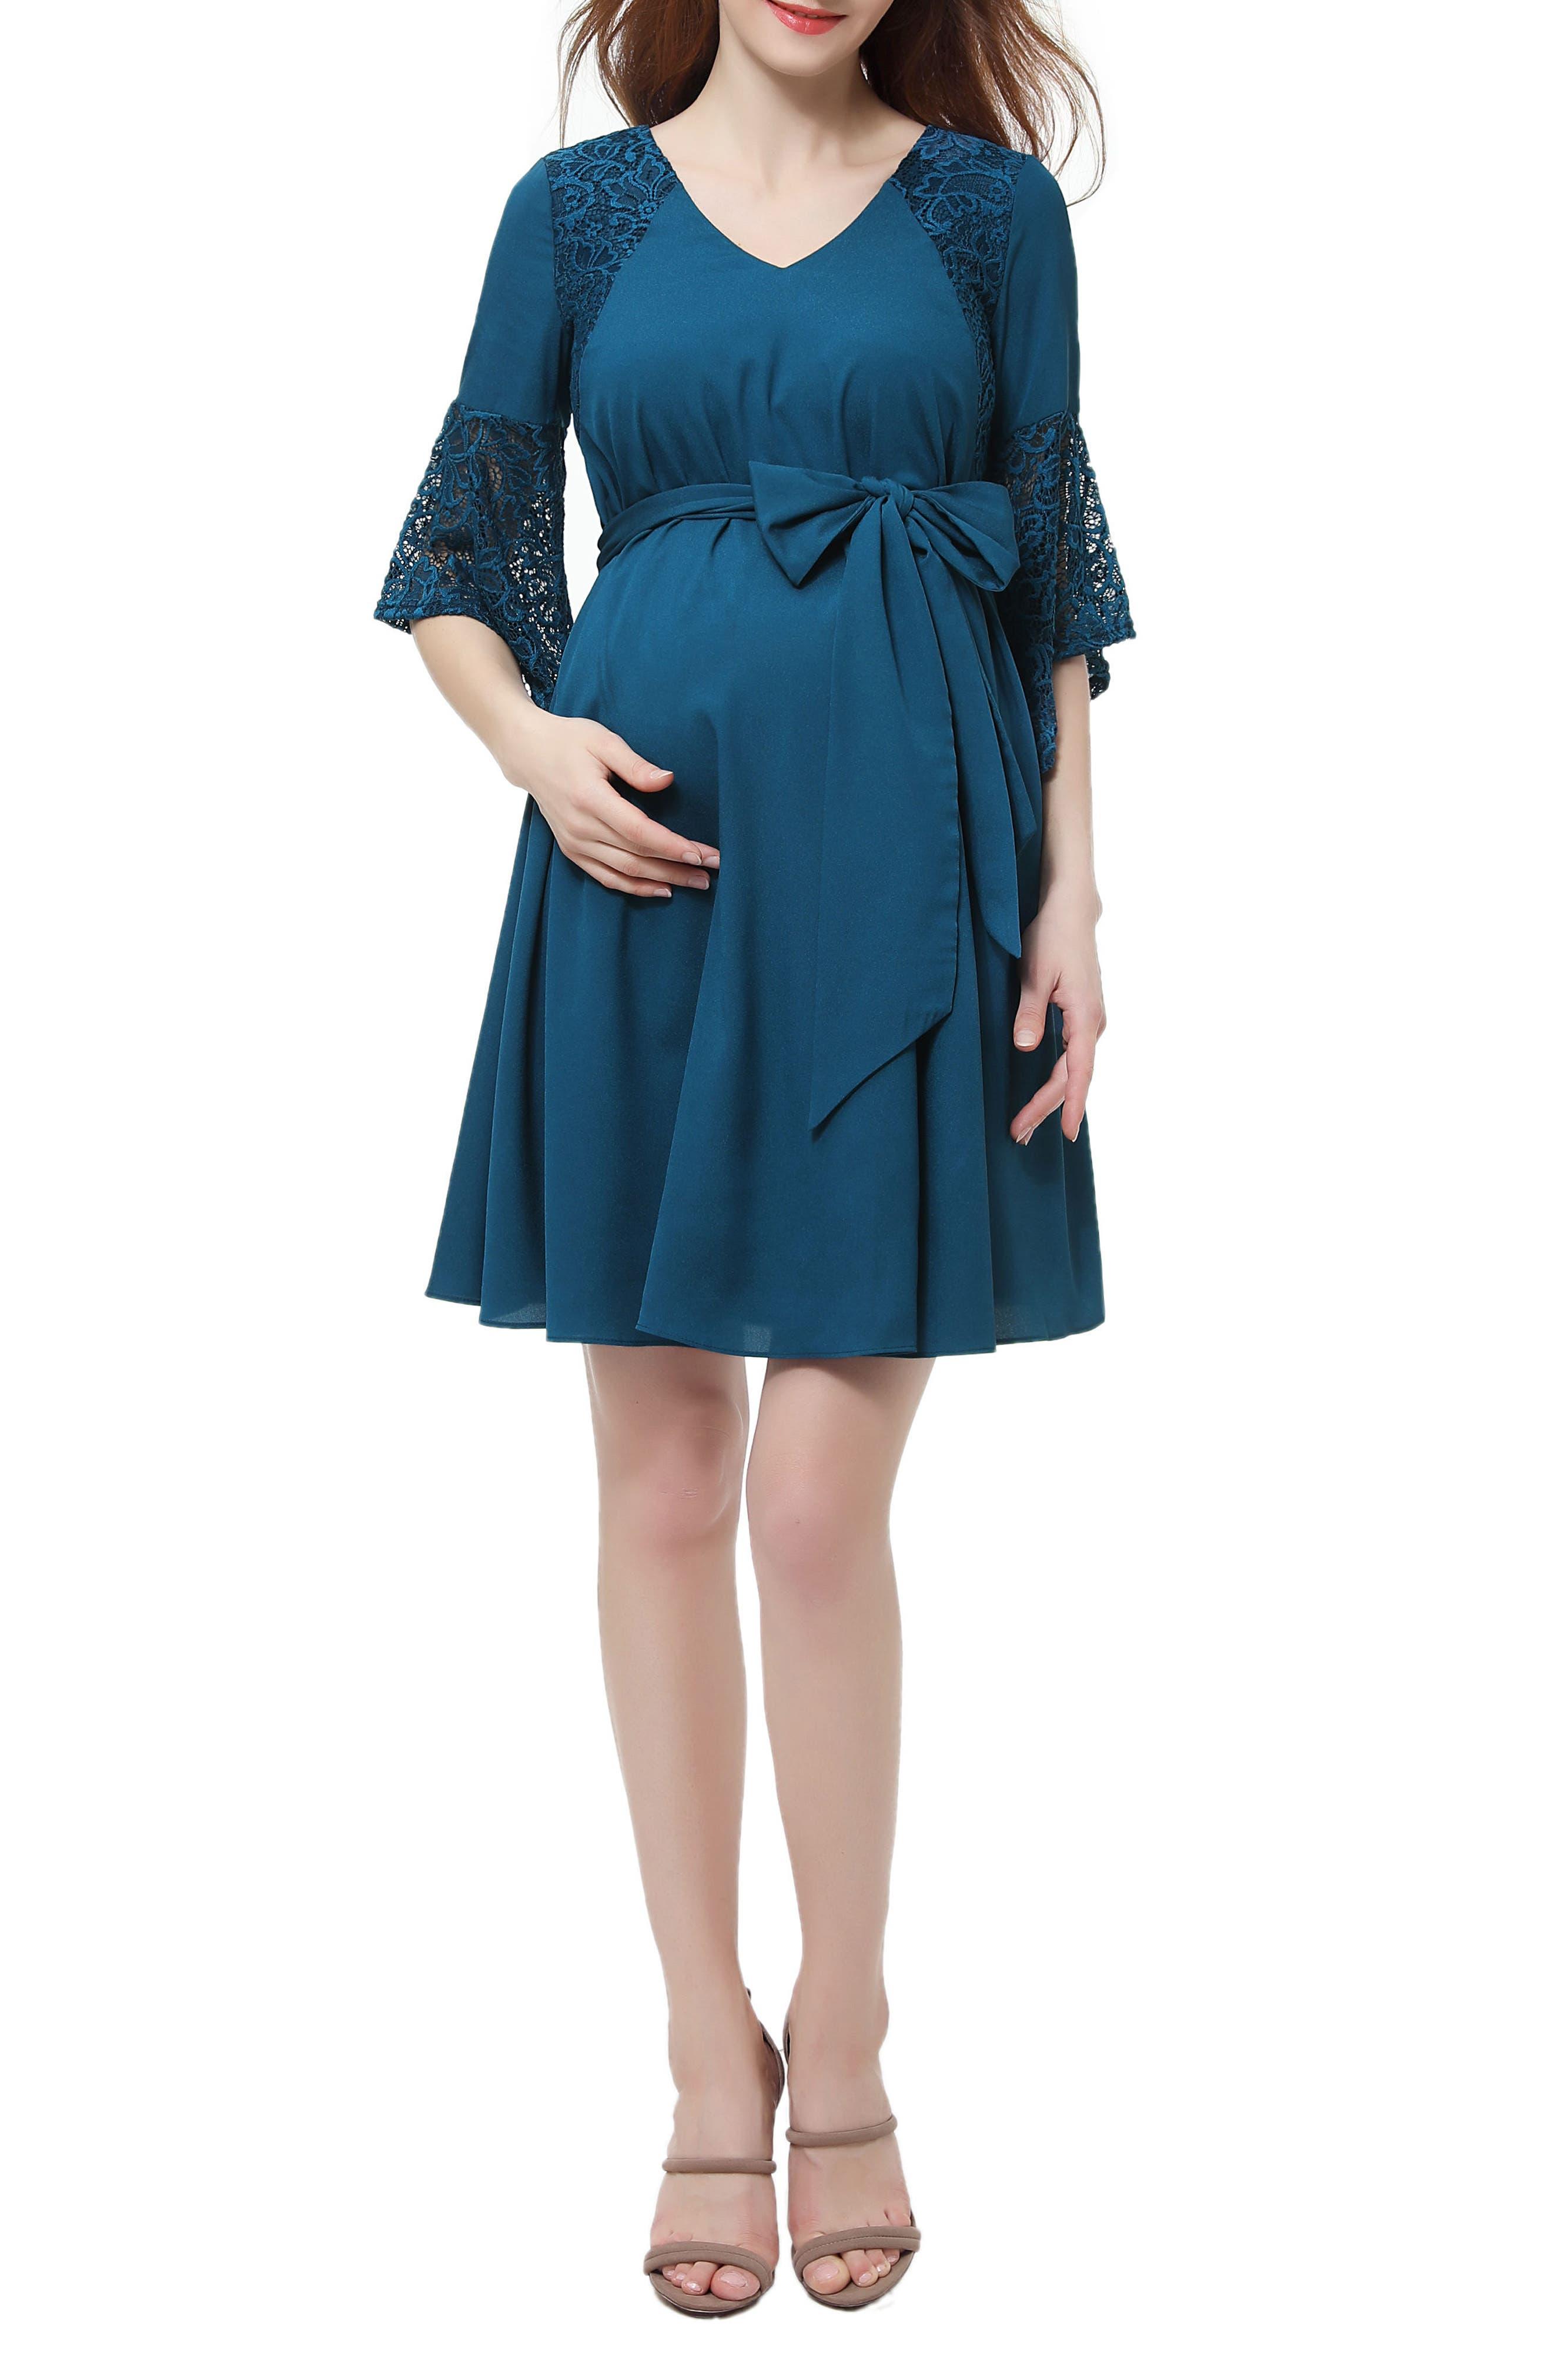 Abbey Lace Trim Maternity Dress,                             Main thumbnail 1, color,                             DEEP SEA